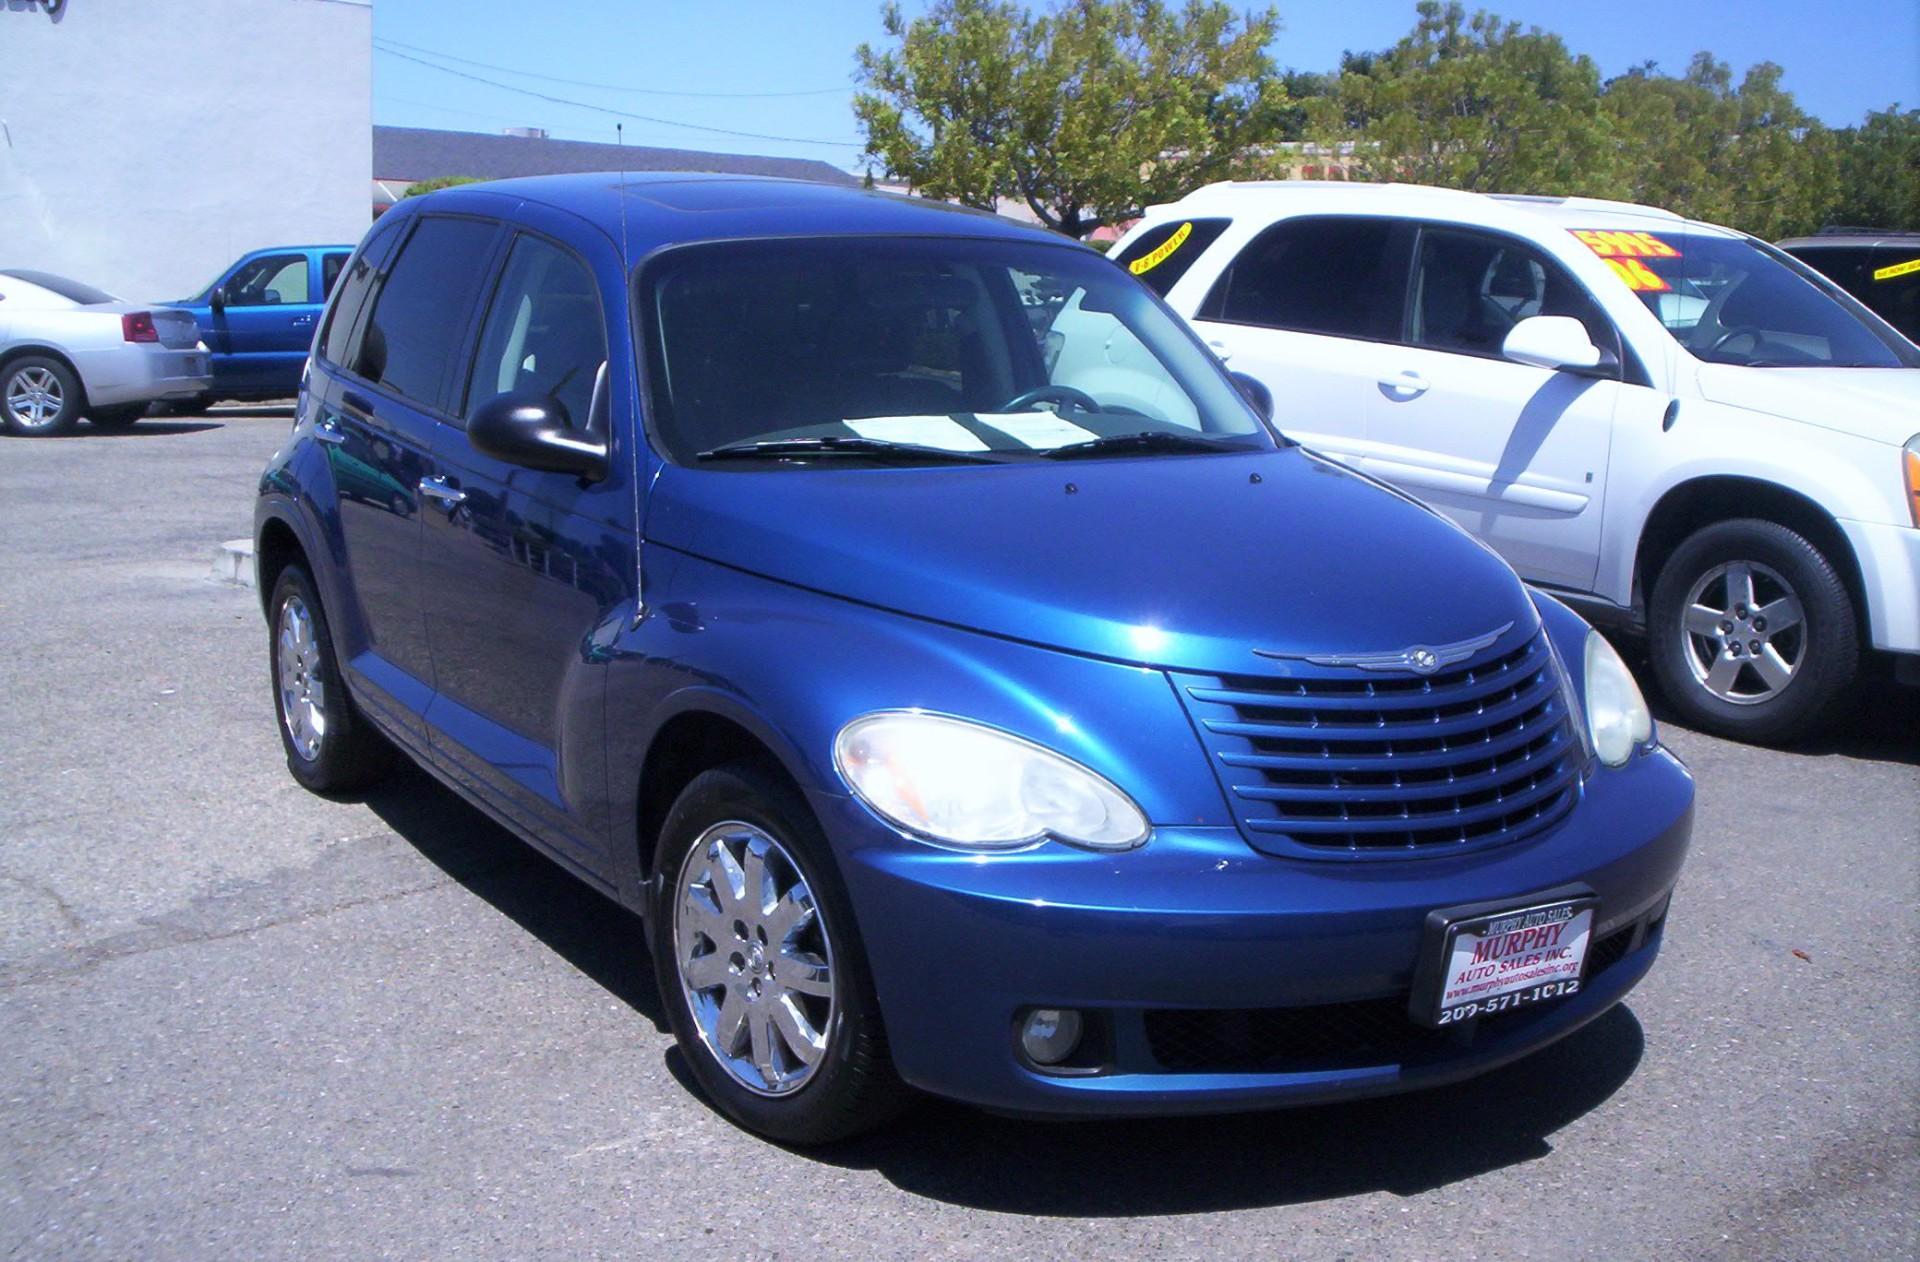 2008 PT Cruiser - $5,995